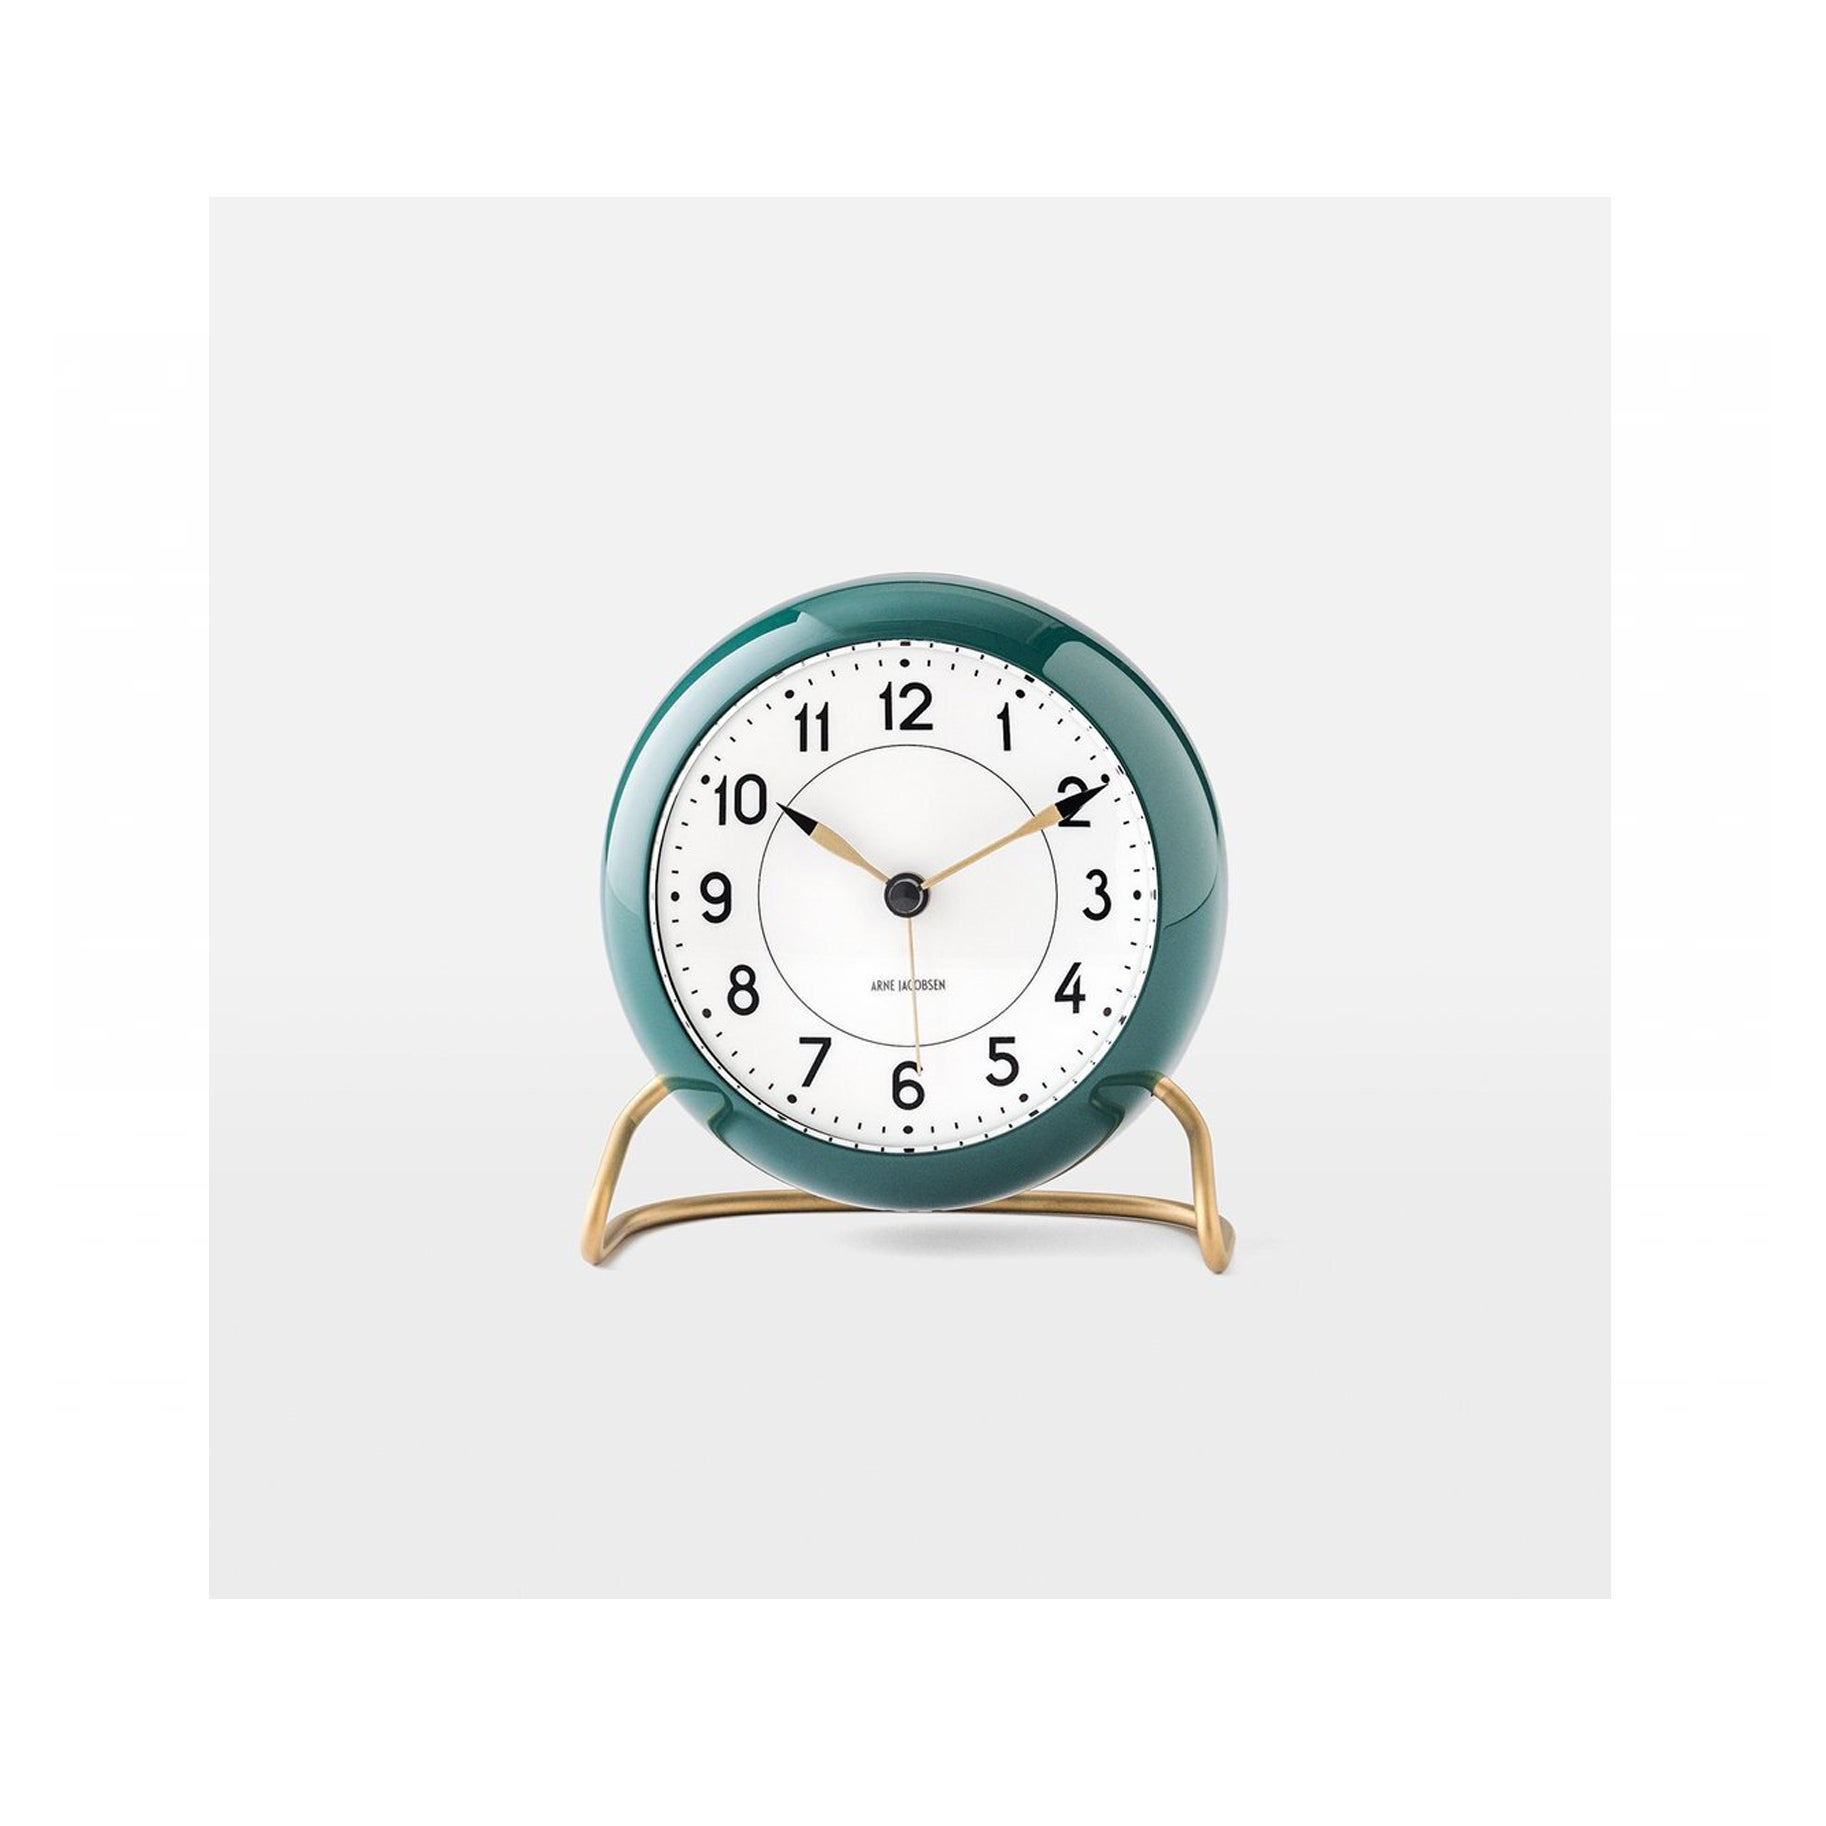 The-Best-Alarm-Clock-Option-Arne-Jacobsen-Alarm-Clock